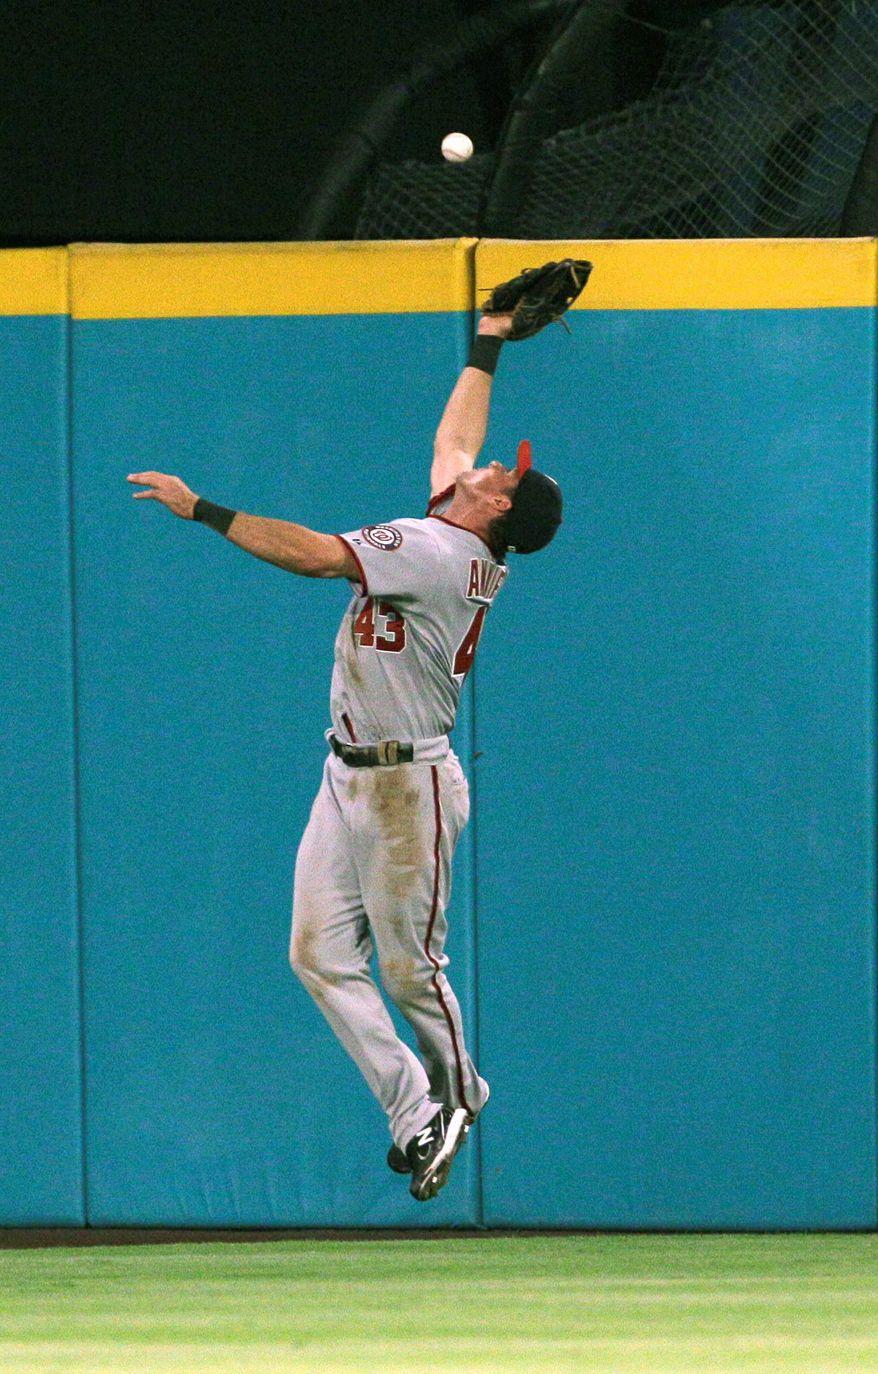 Washington Nationals' center fielder Rick Ankiel. (Associated Press)